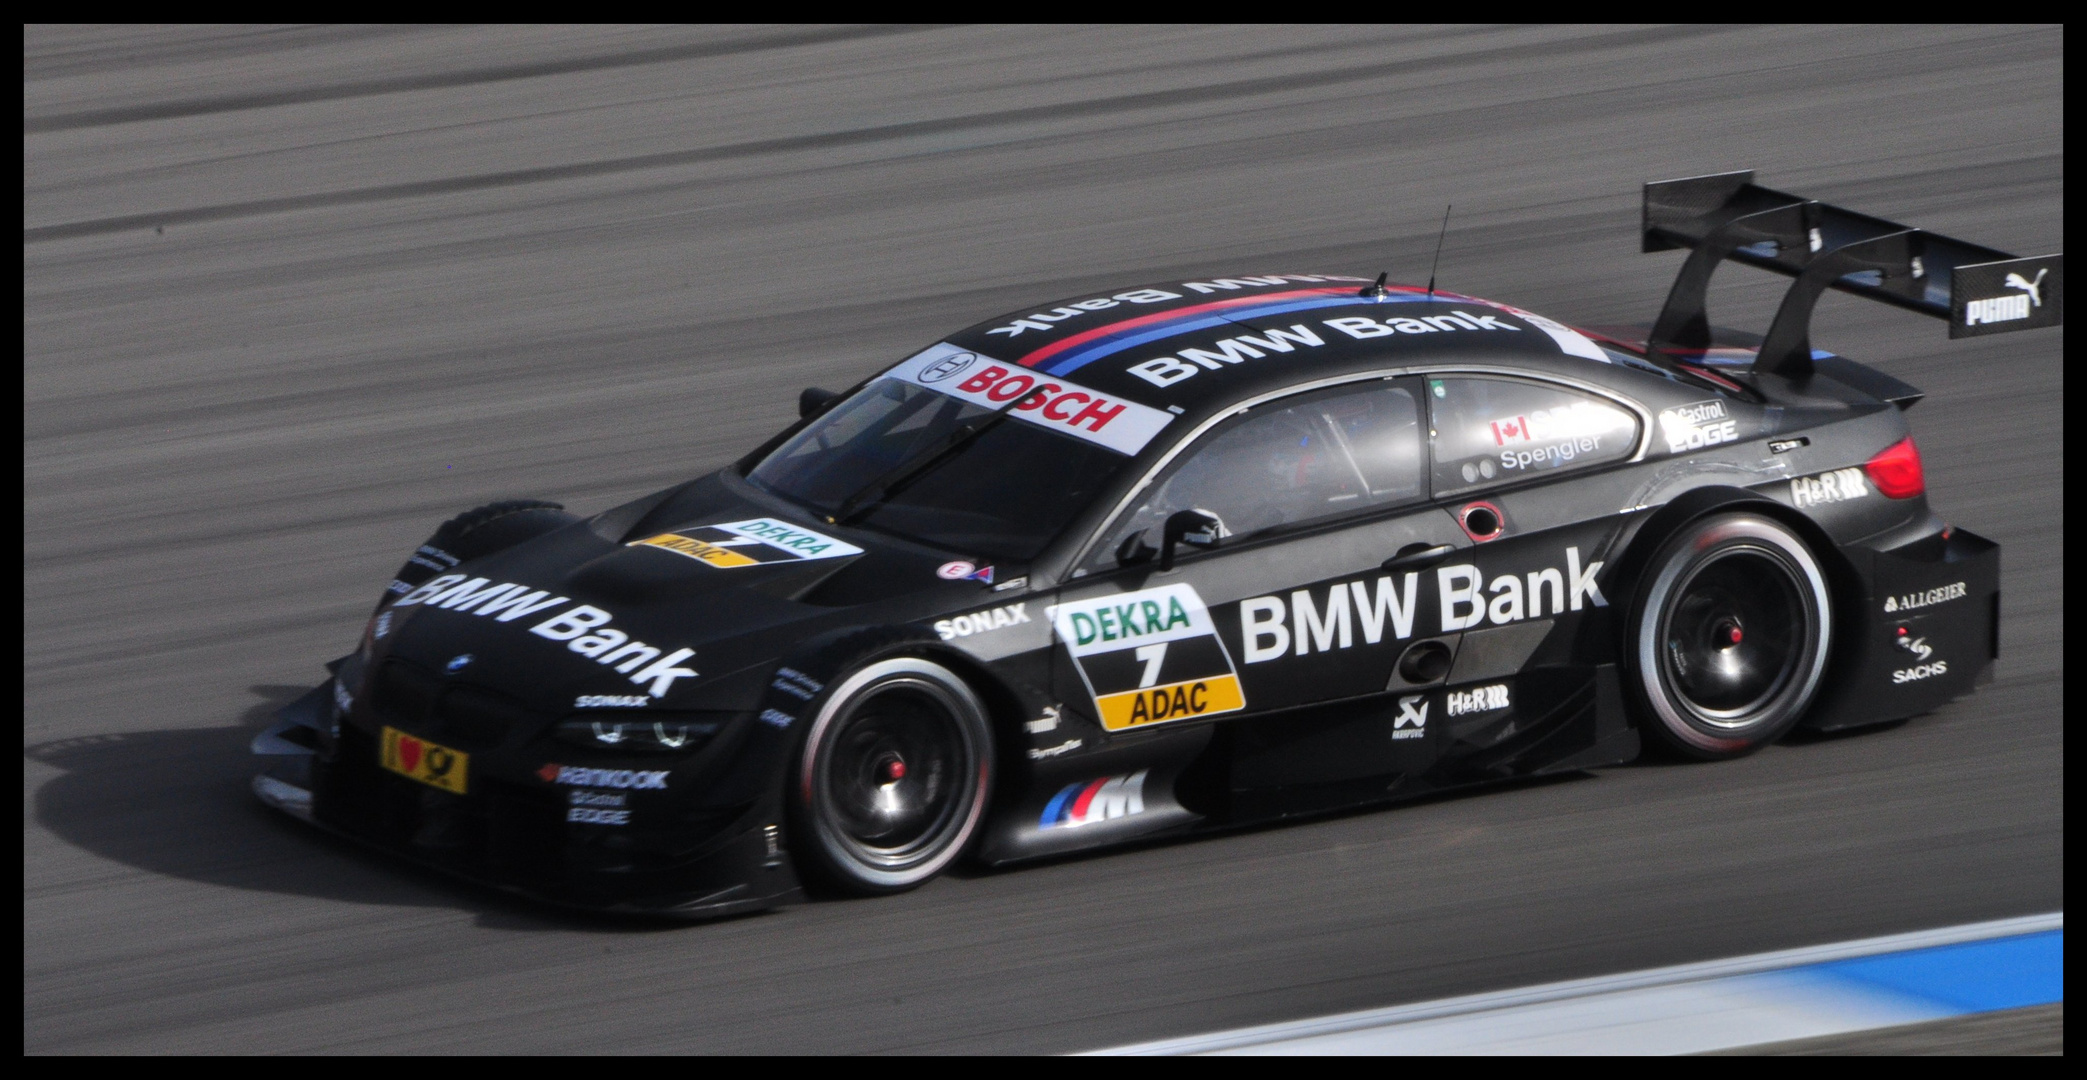 Der neue Meister der DTM - Bruno Spengler